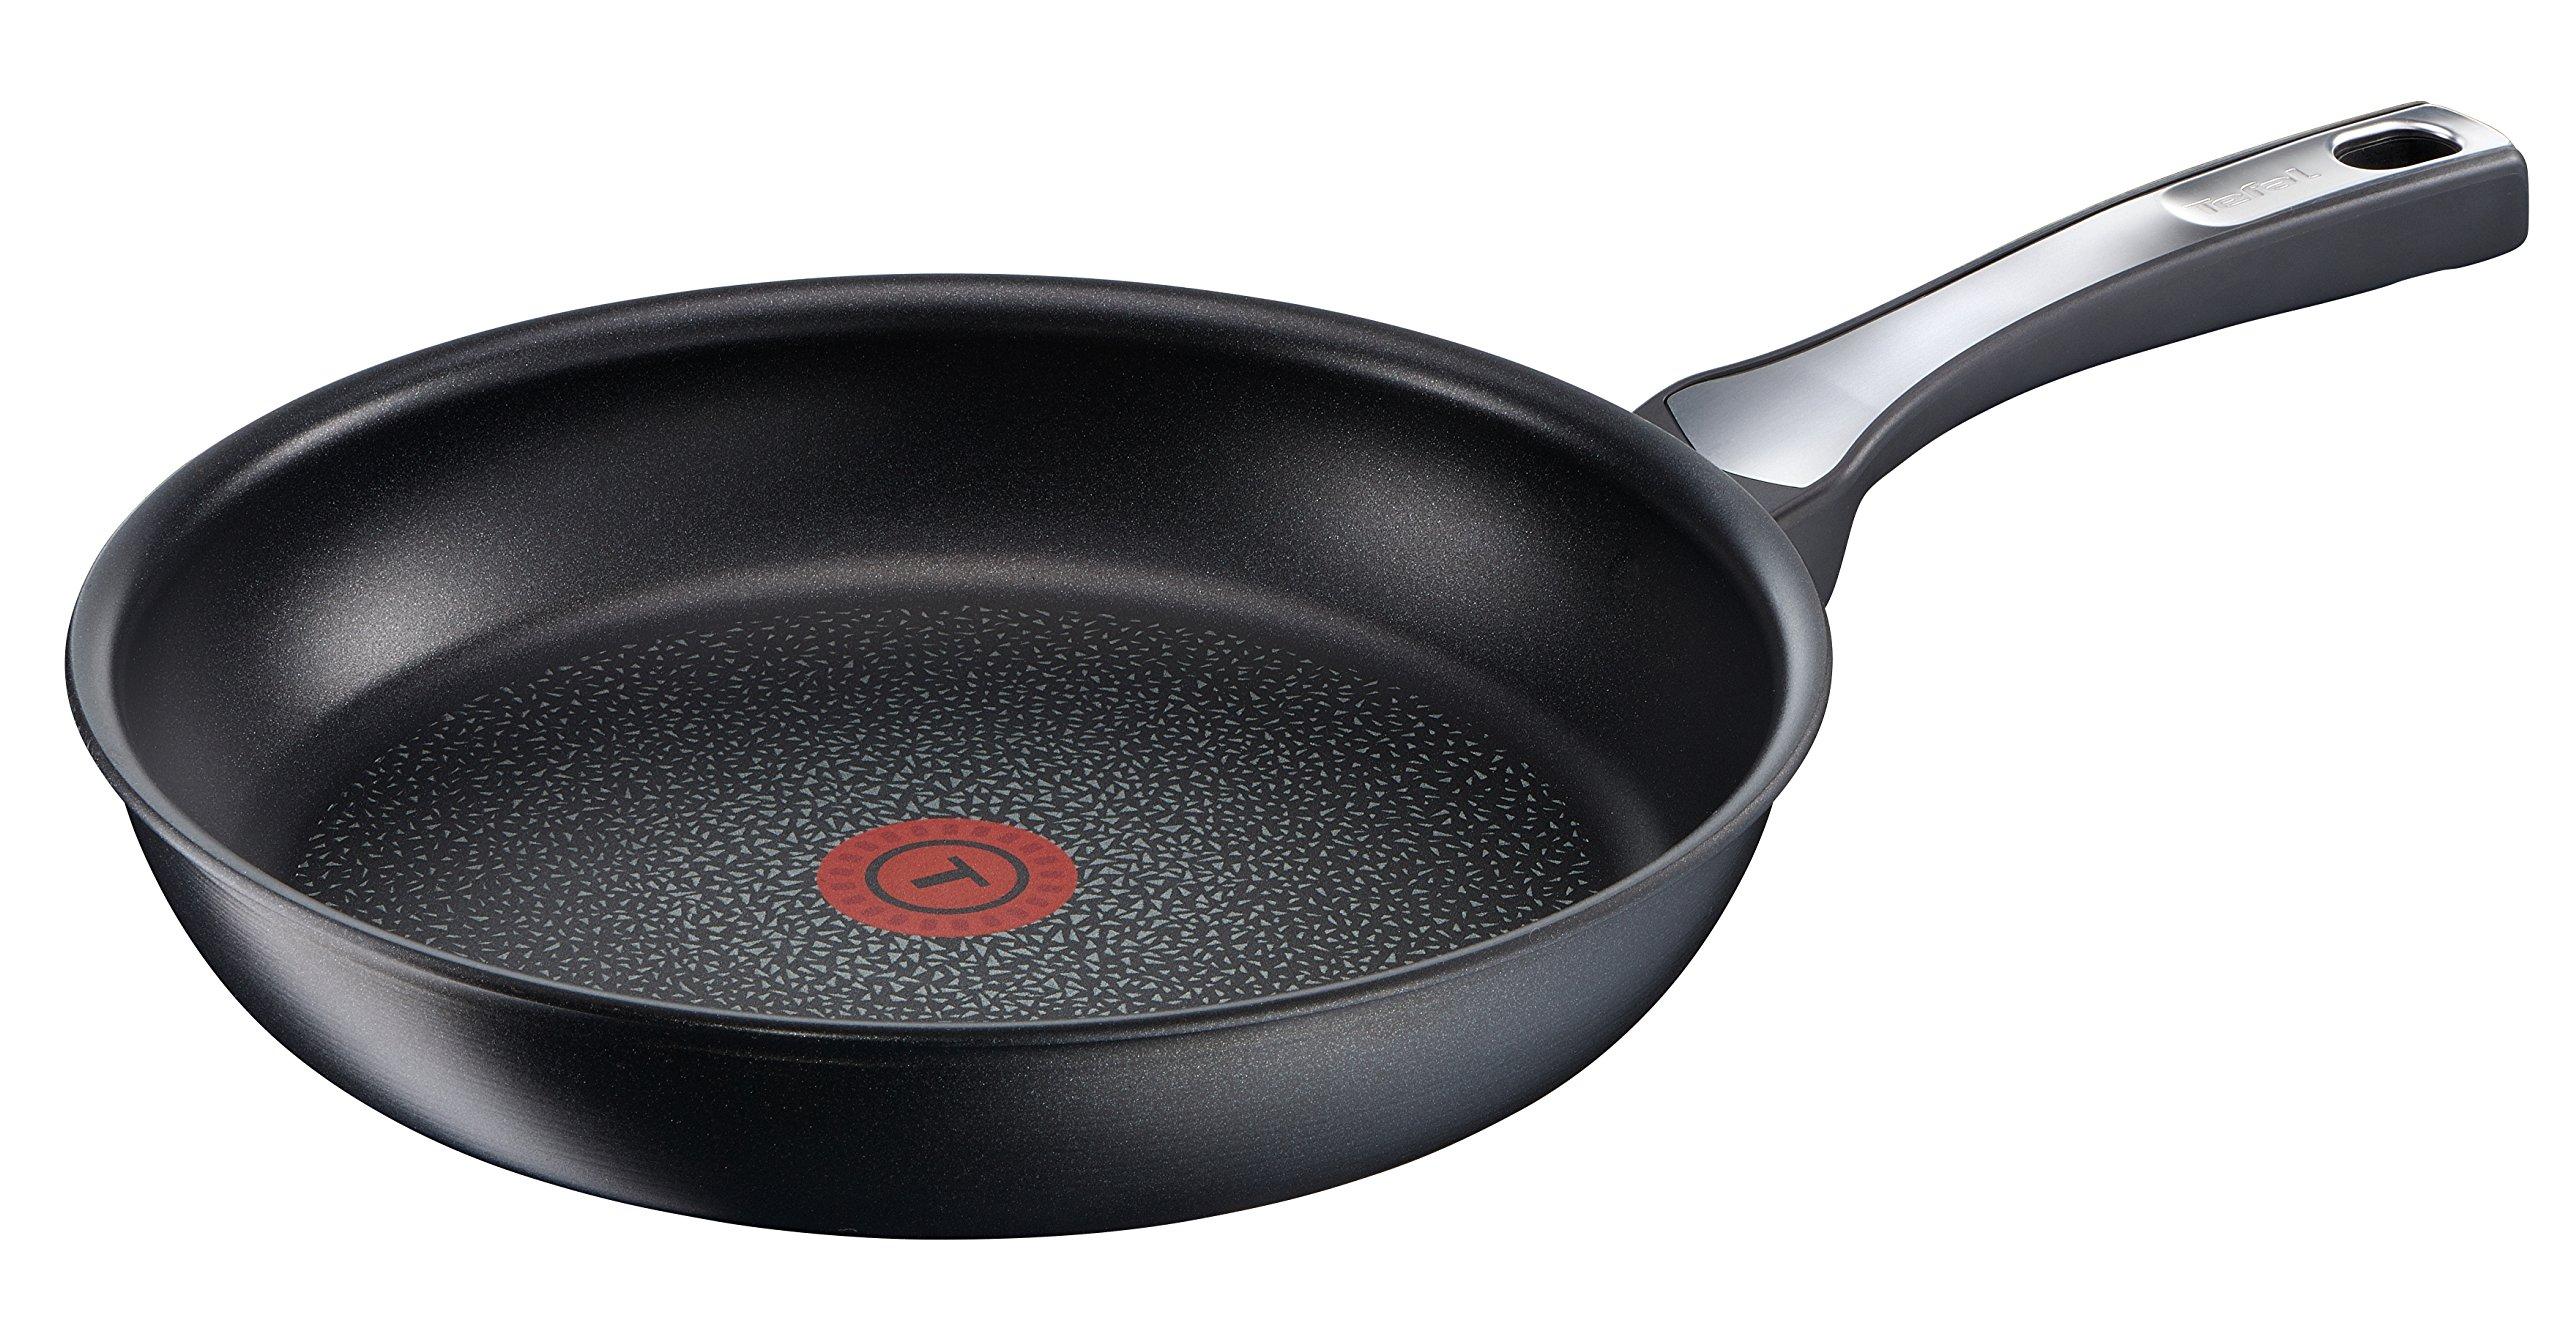 Tefal Expertise Frying Pan, 21 cm - Black 1